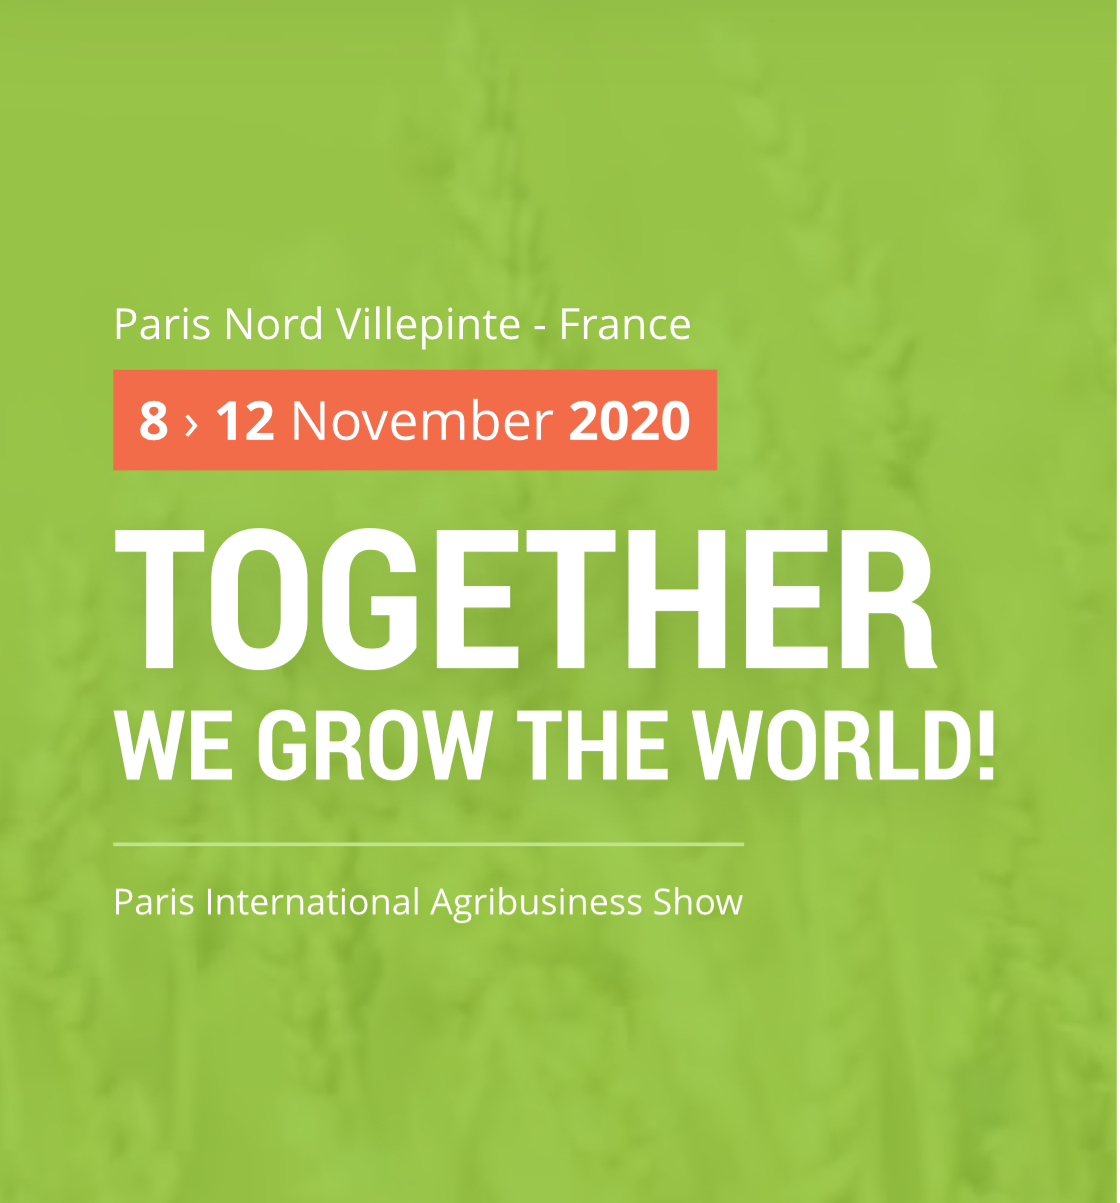 SIMA Paris - SIMA PARIS | November 8-12, 2020